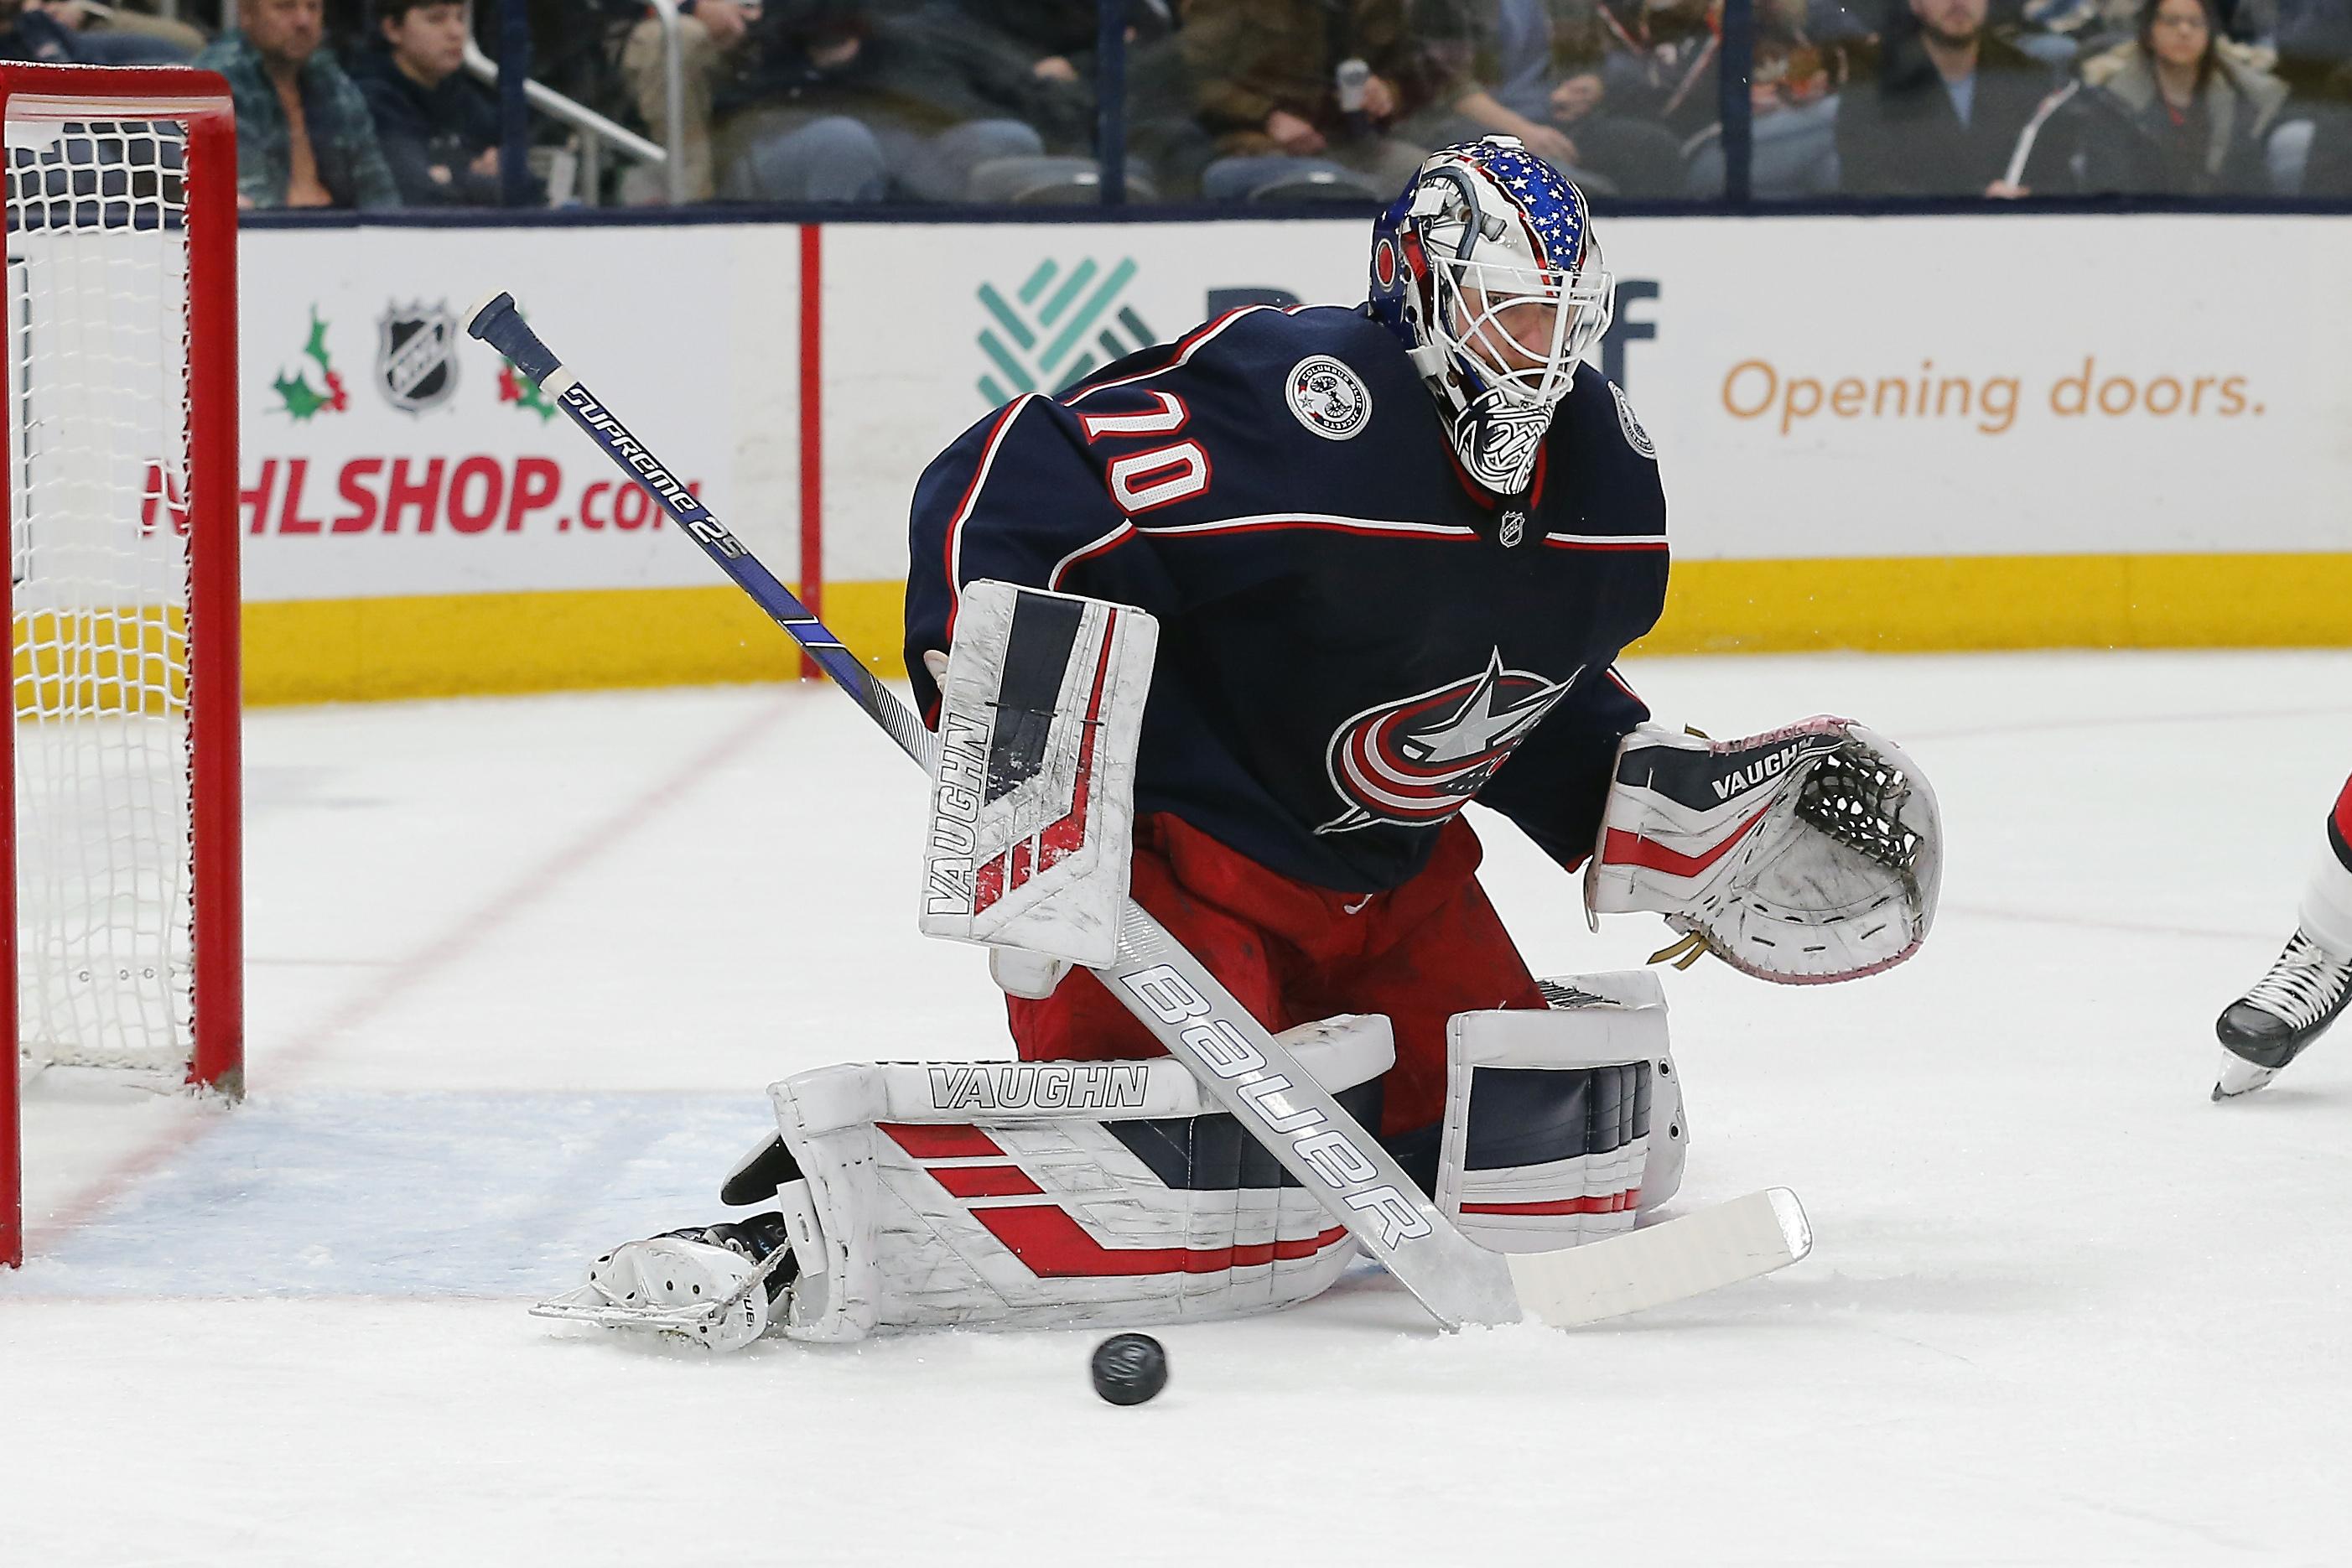 Joonas Korpisalo records second career NHL shutout